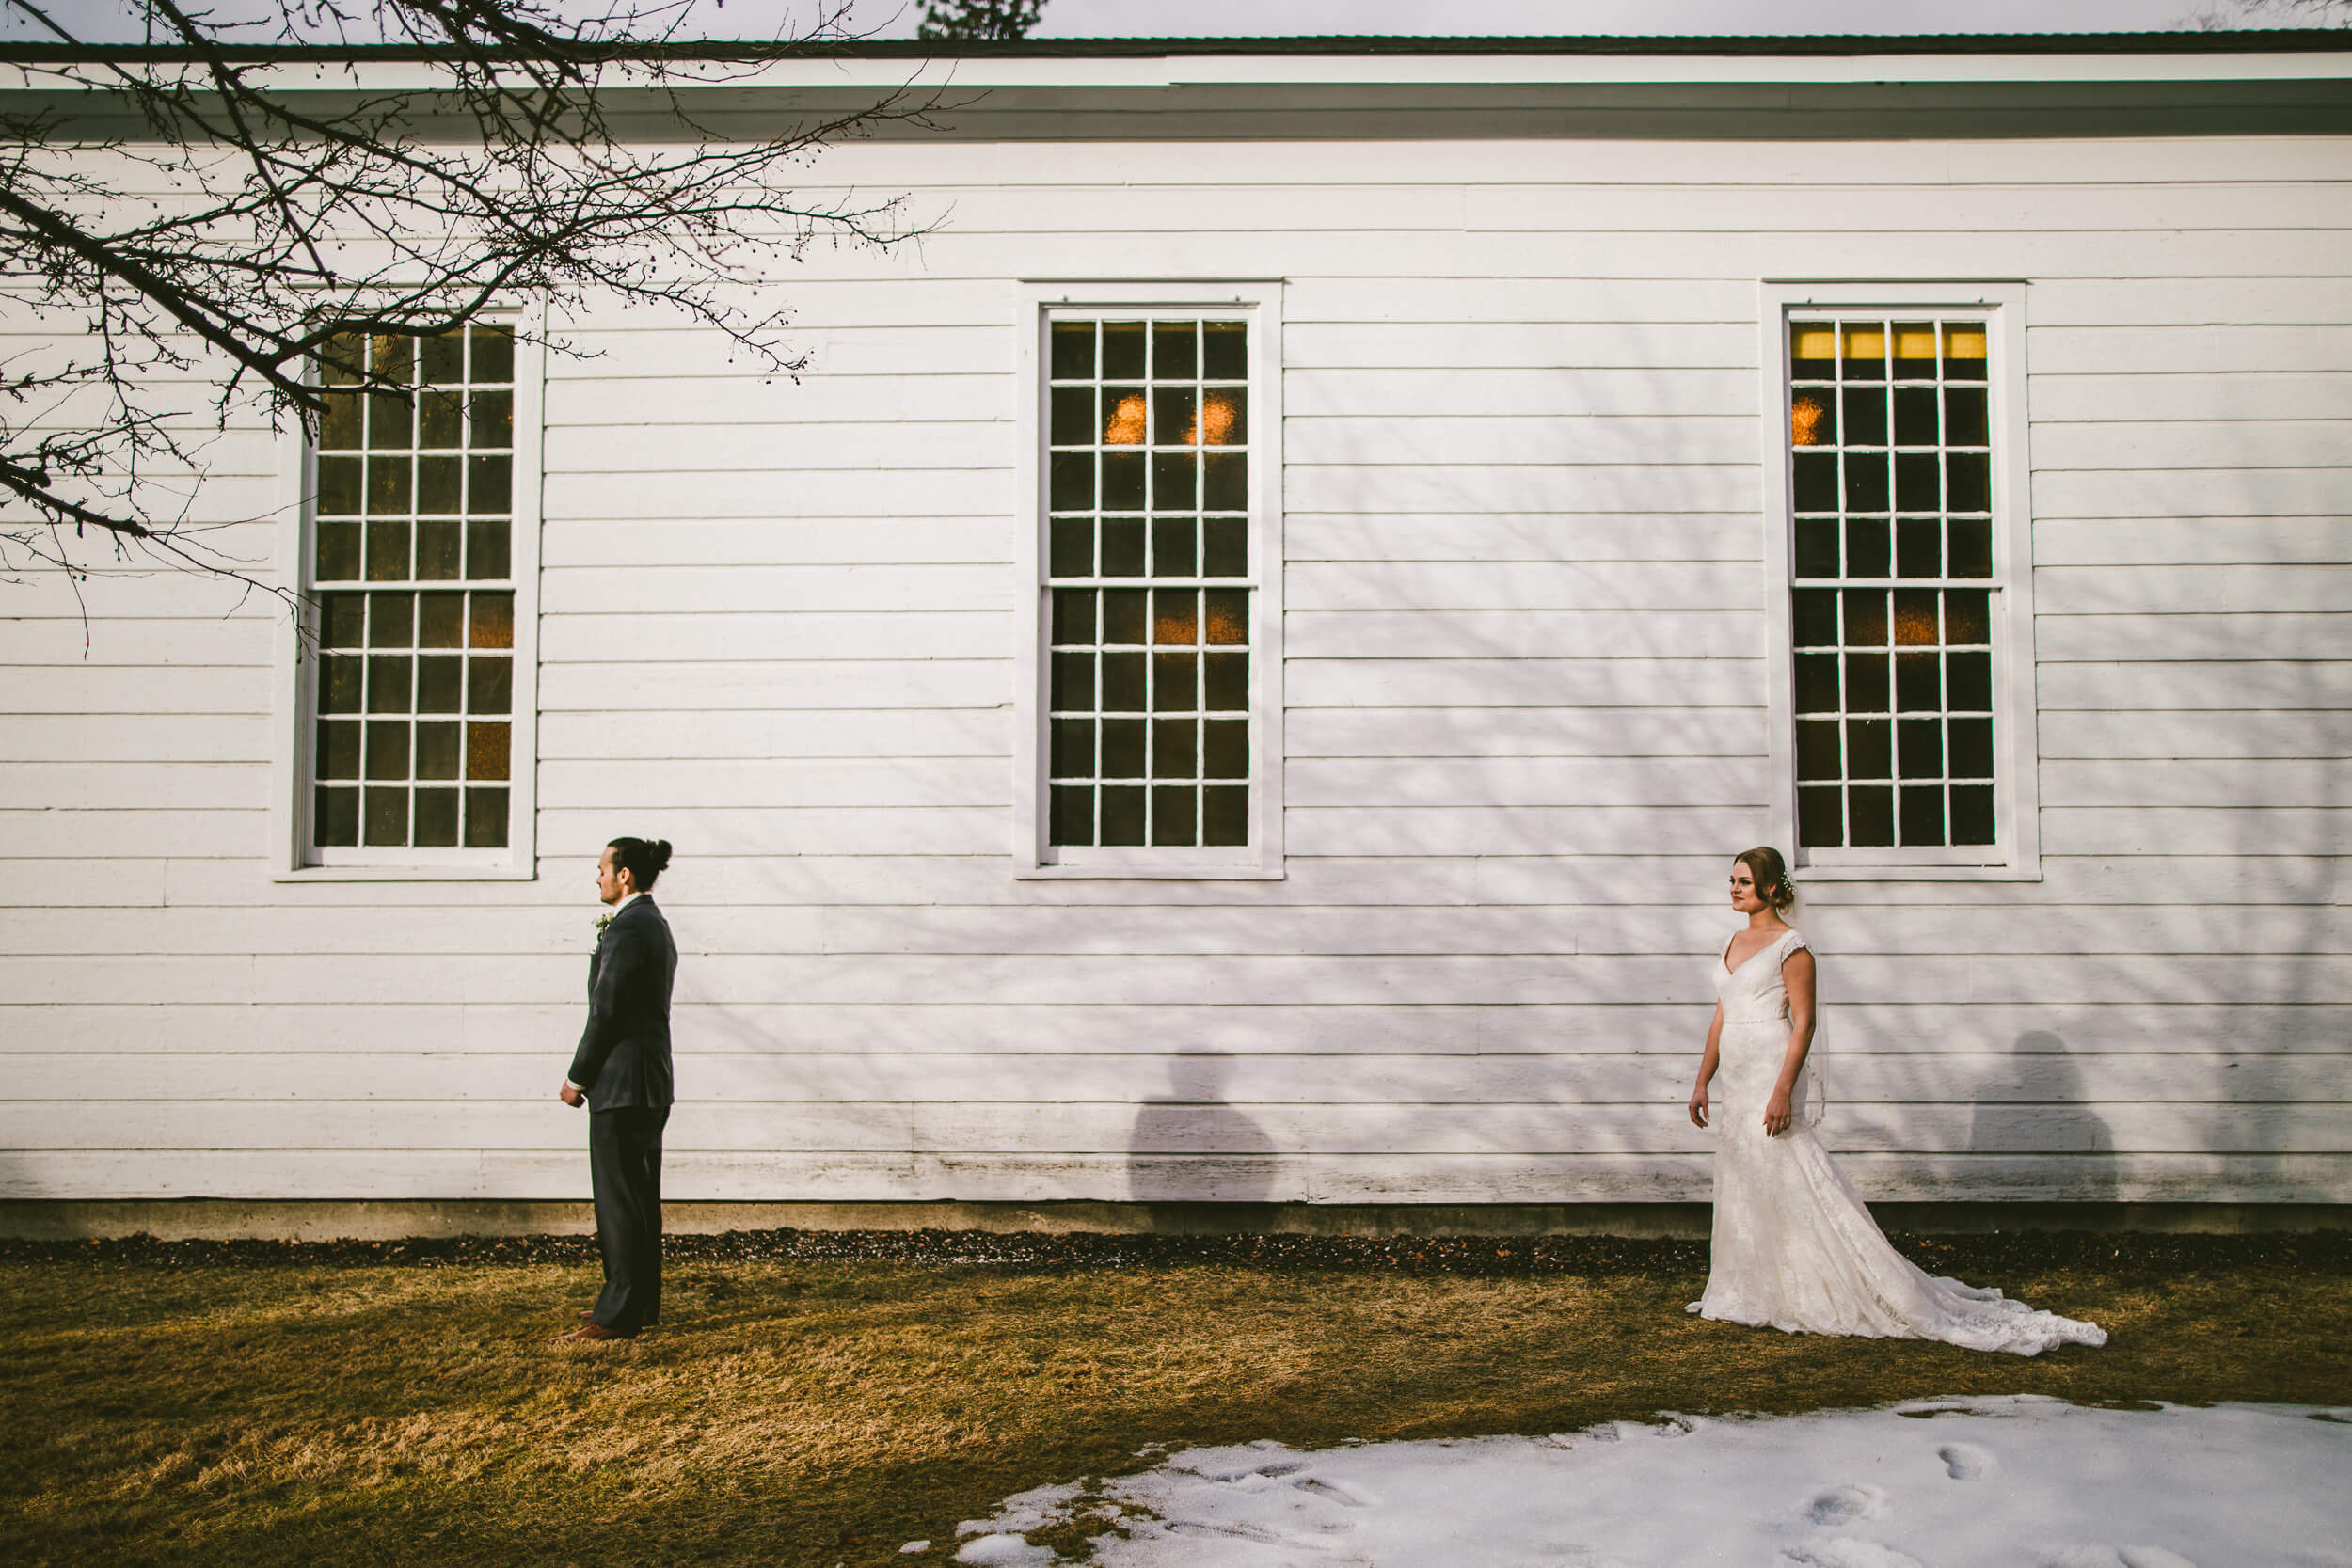 mukogawa winter wedding in spokane (67).jpg